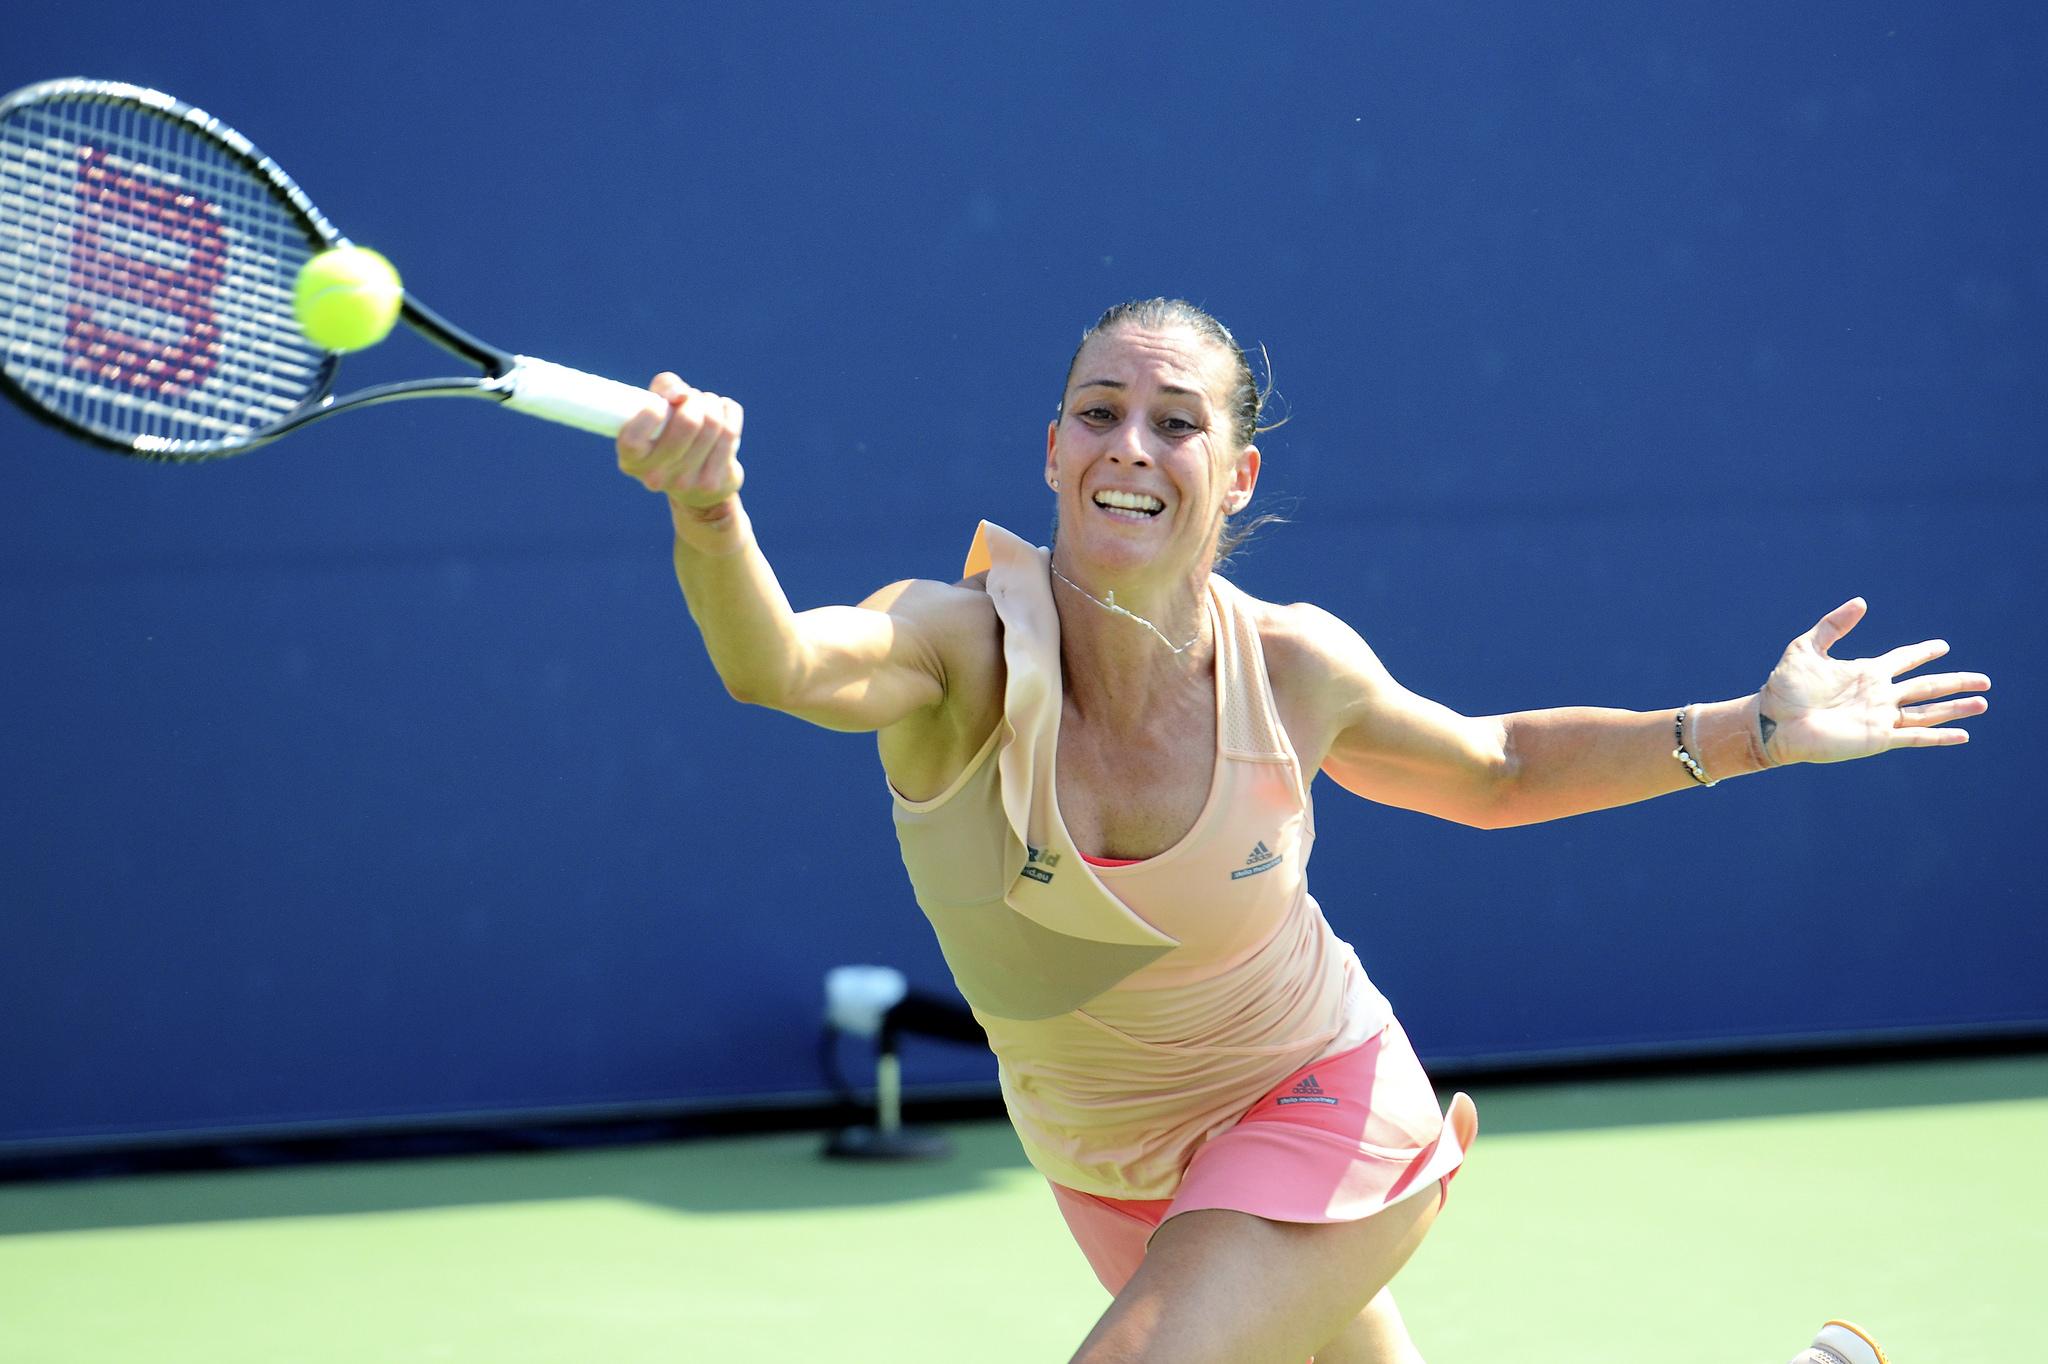 2014 US Open (Tennis) - Tournament - Flavia Pennetta, Steven Pisano August 26, 2014